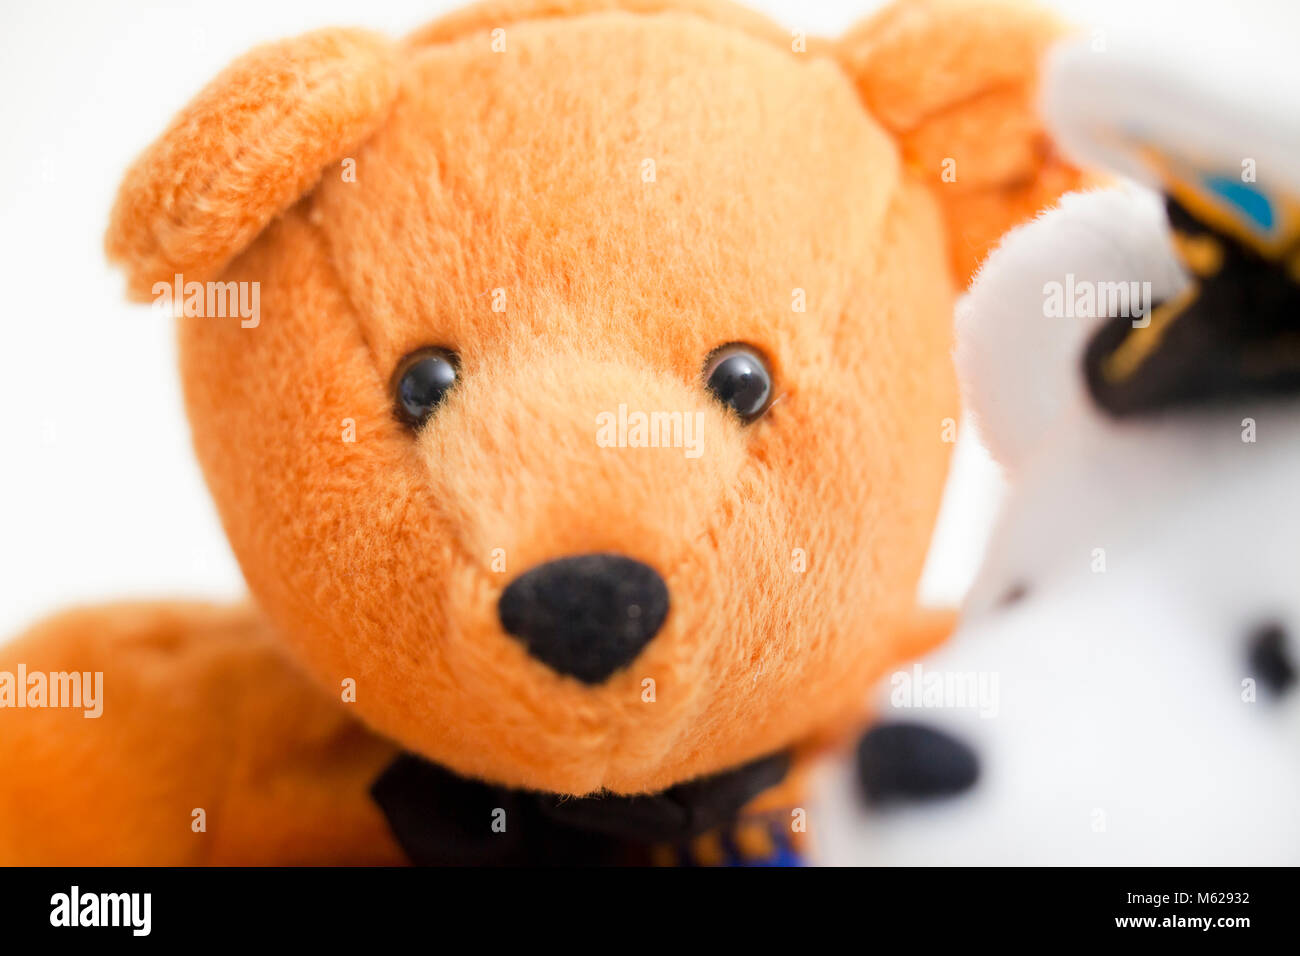 Teddy Bears Stockfotos & Teddy Bears Bilder - Alamy